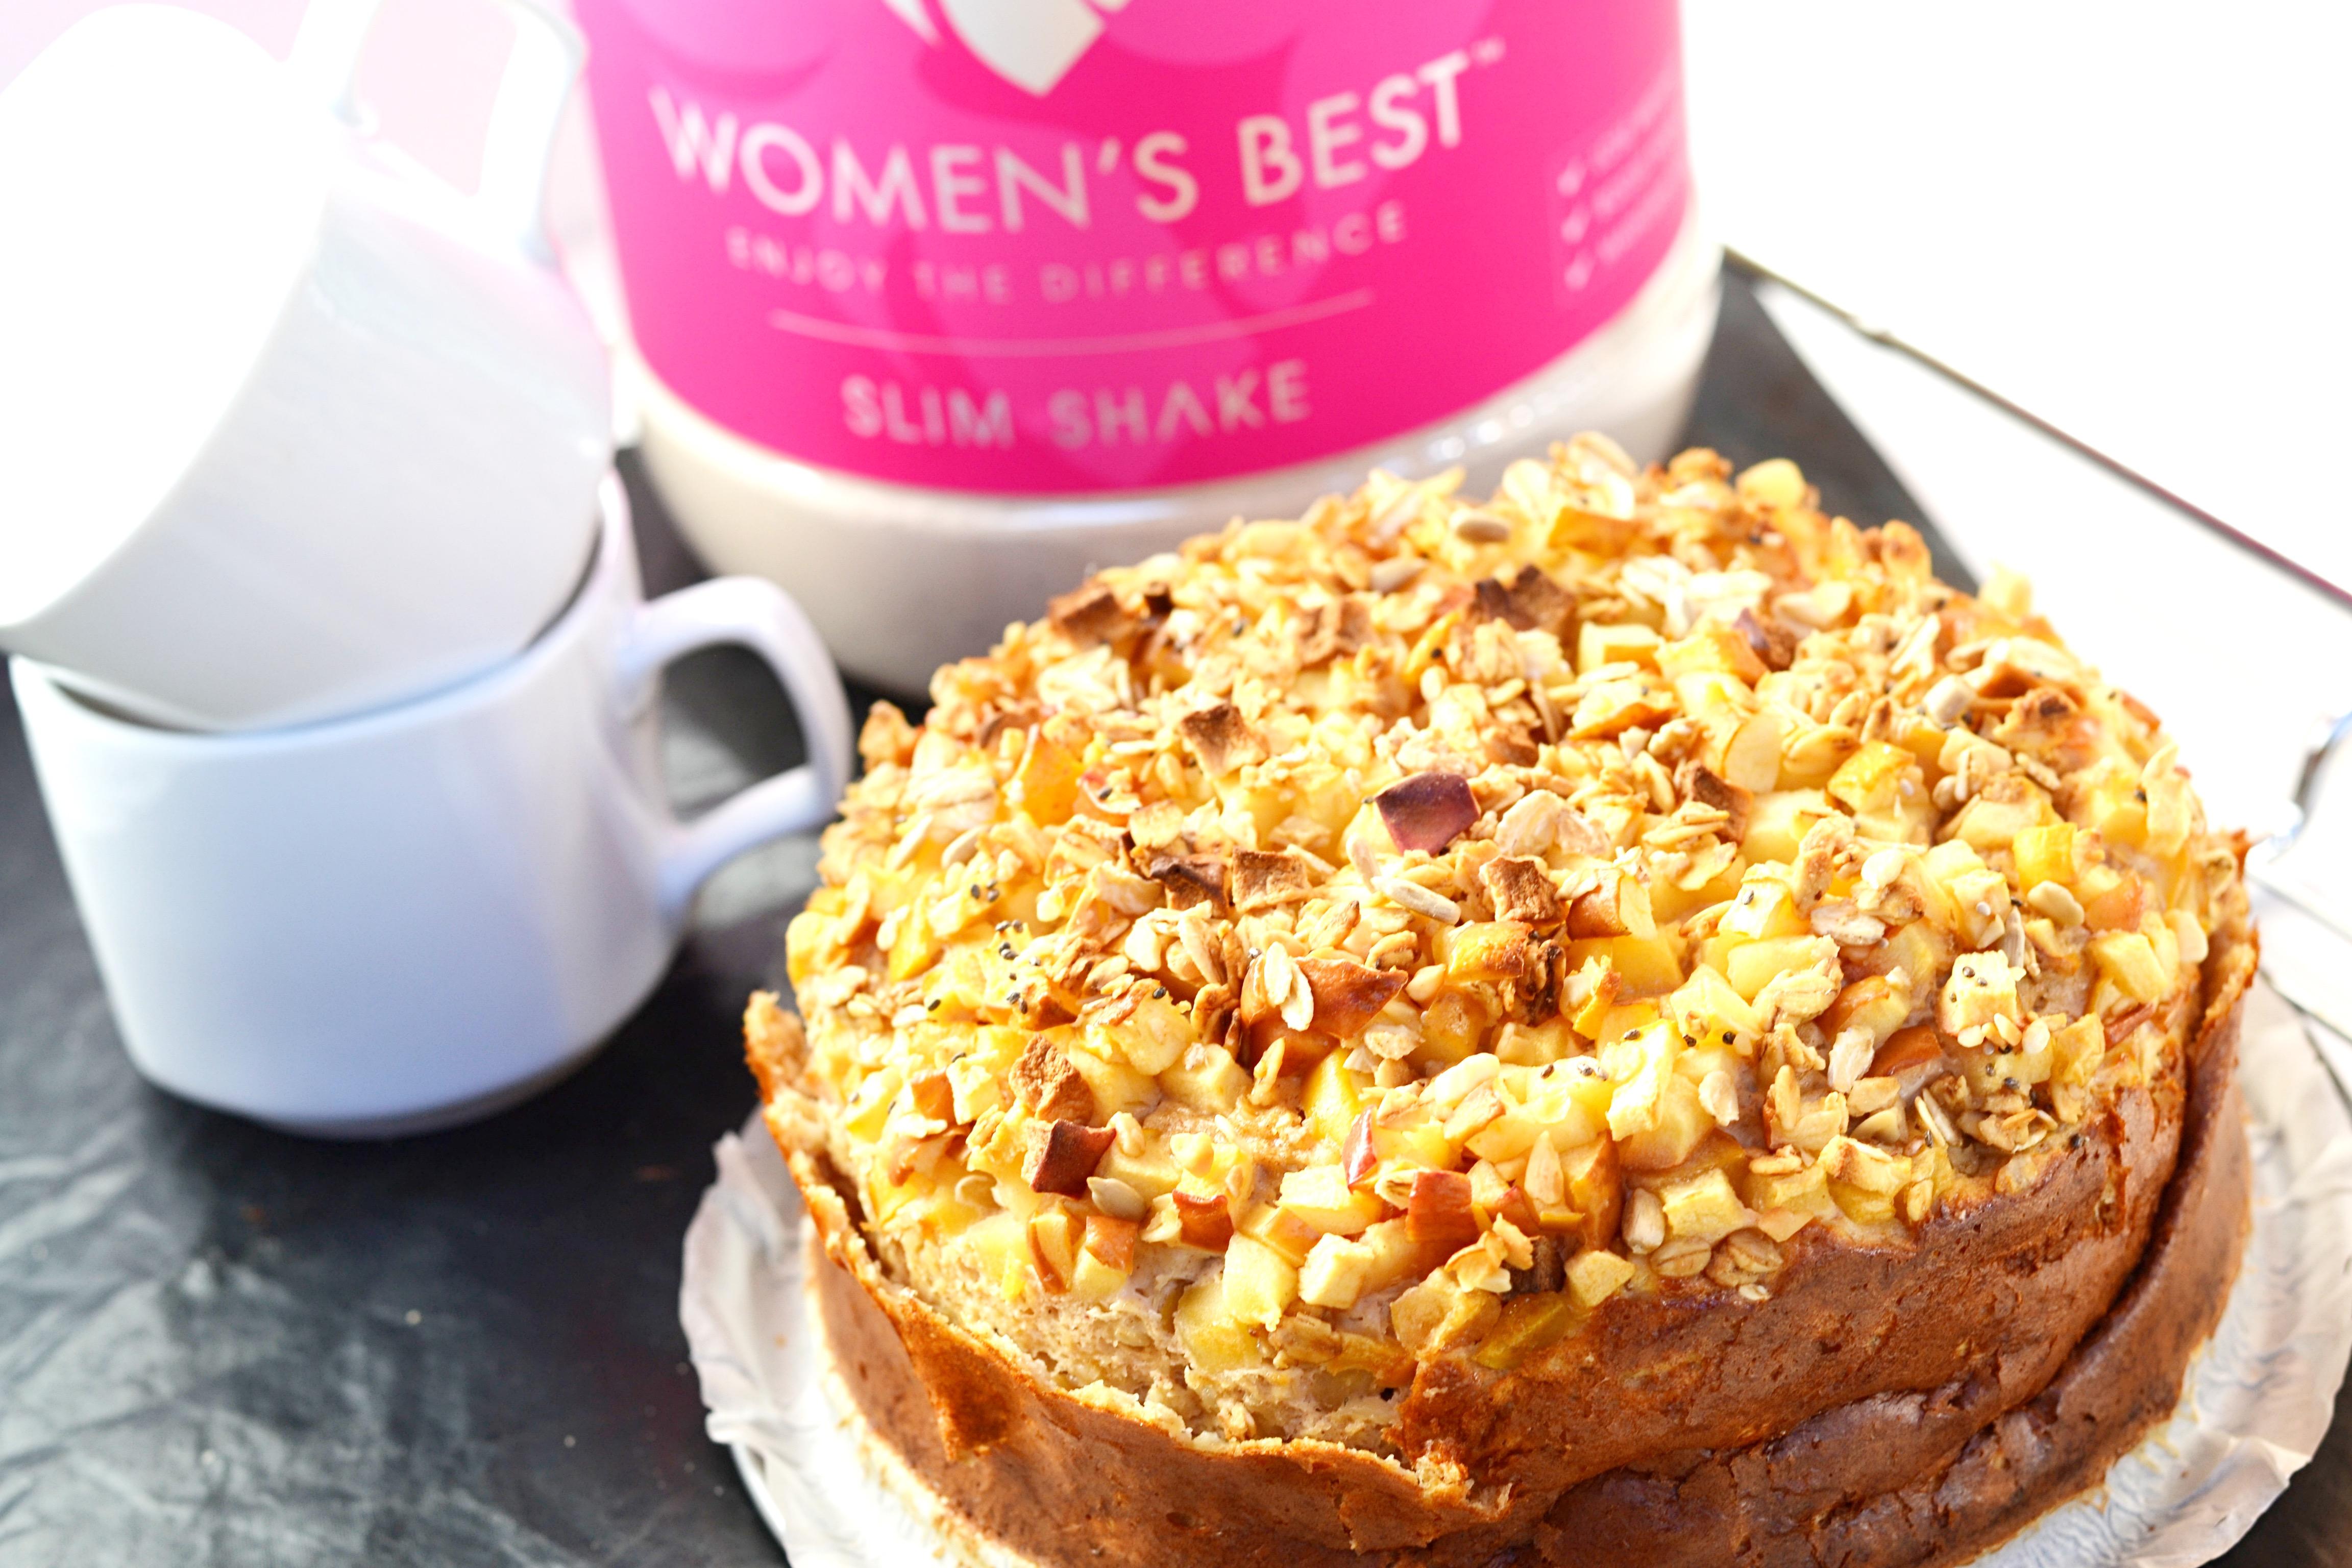 Women S Best Slim Shake Review Christina Weissbacher